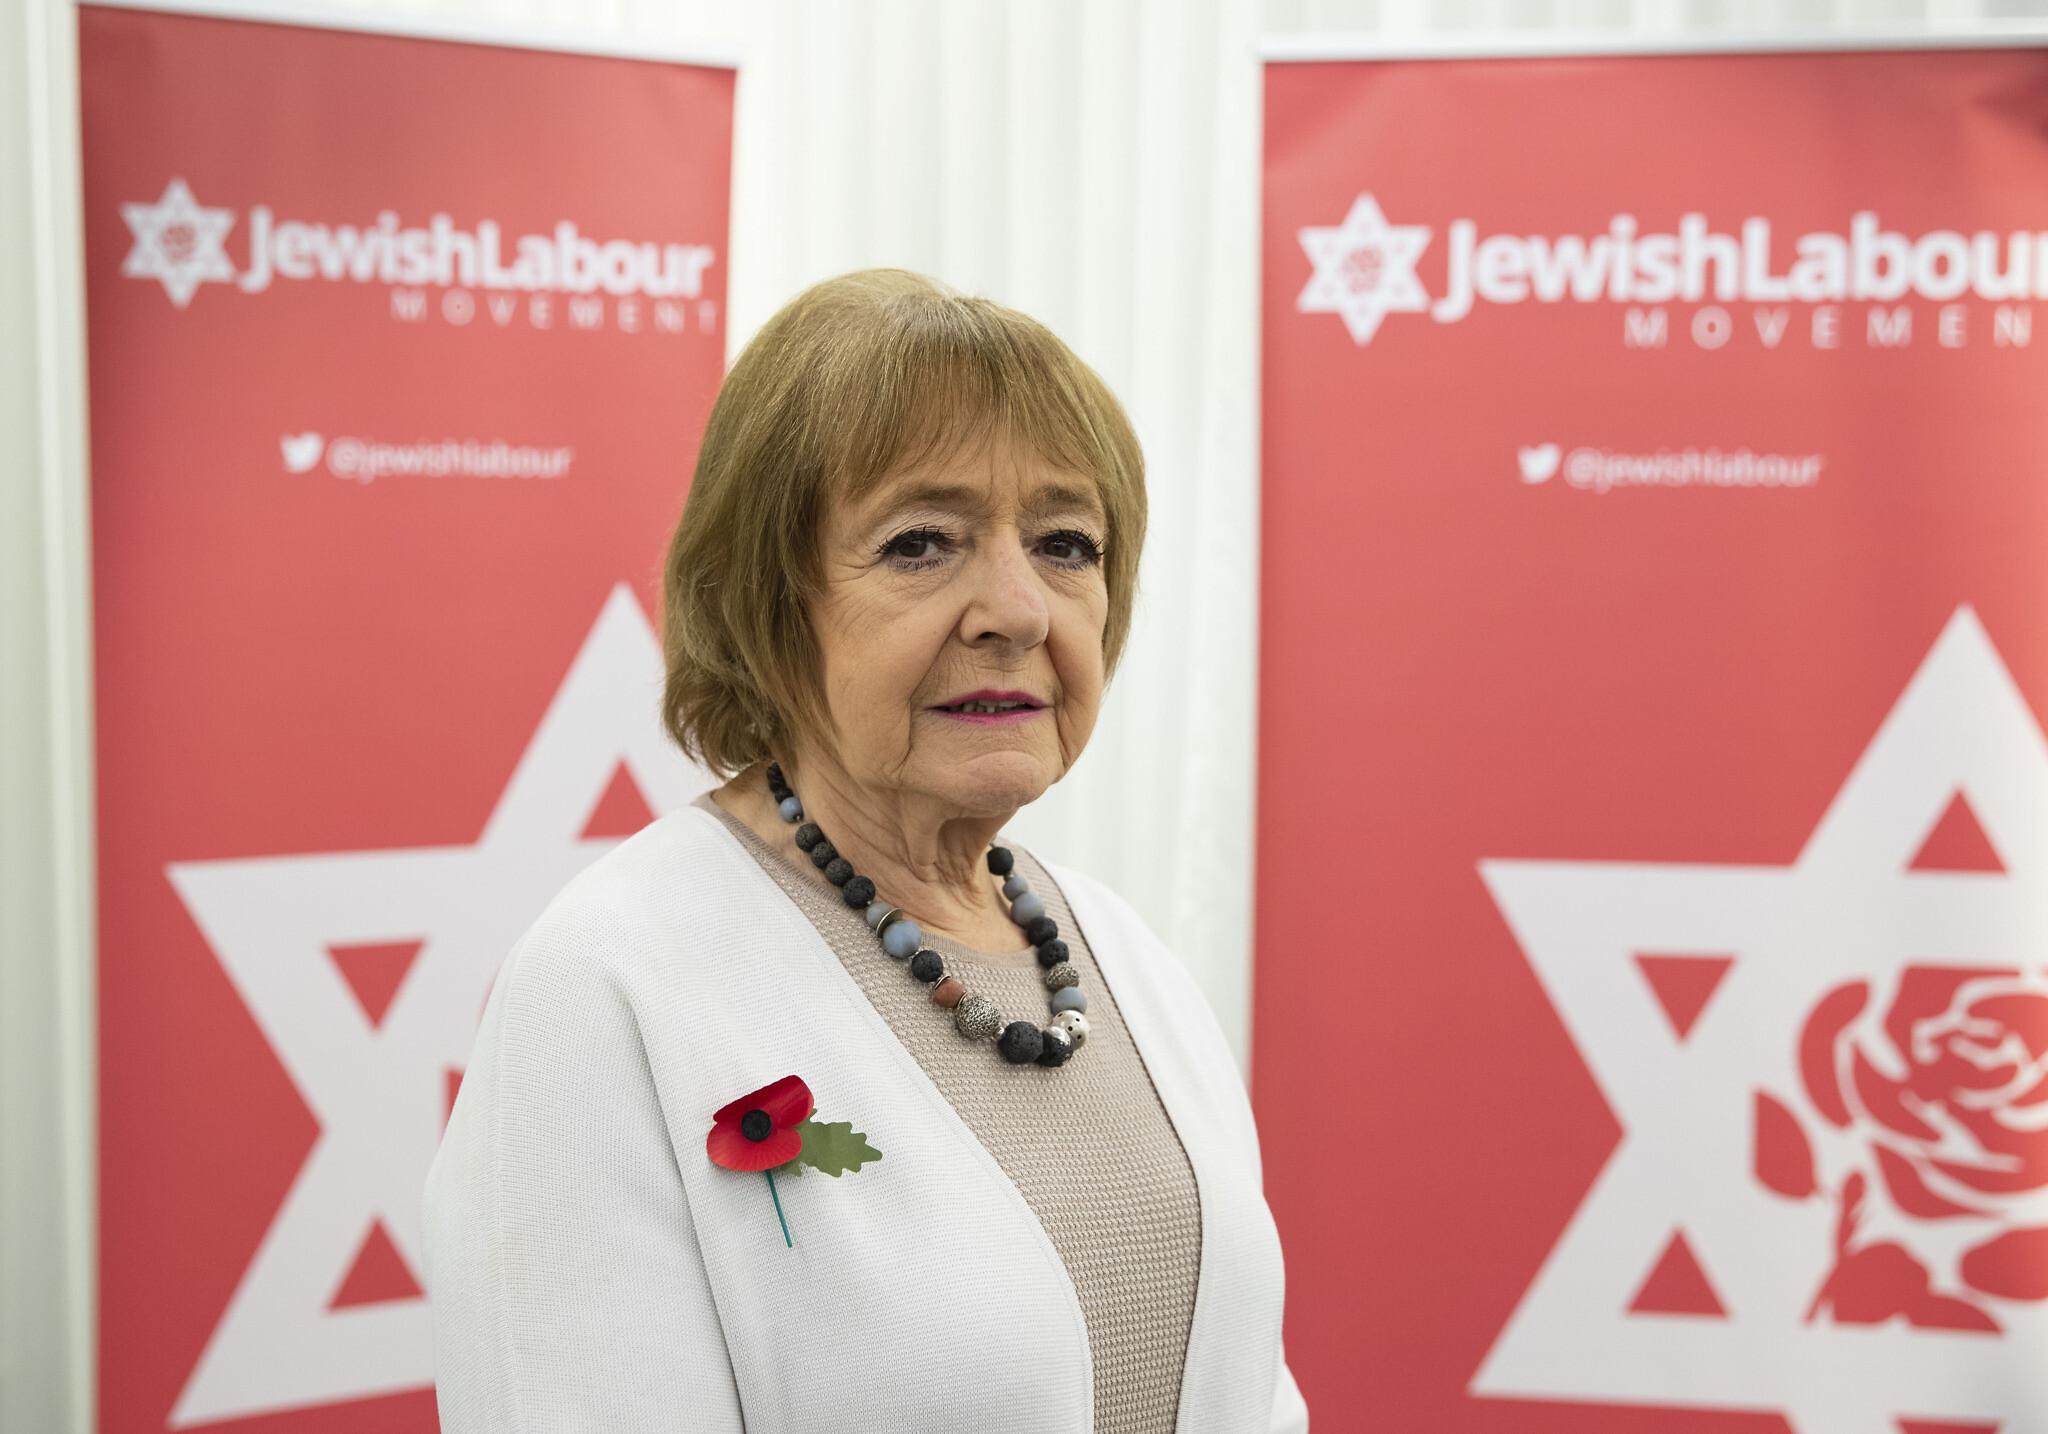 Dame Margaret Hodge: In last few weeks I've had more abuse ...